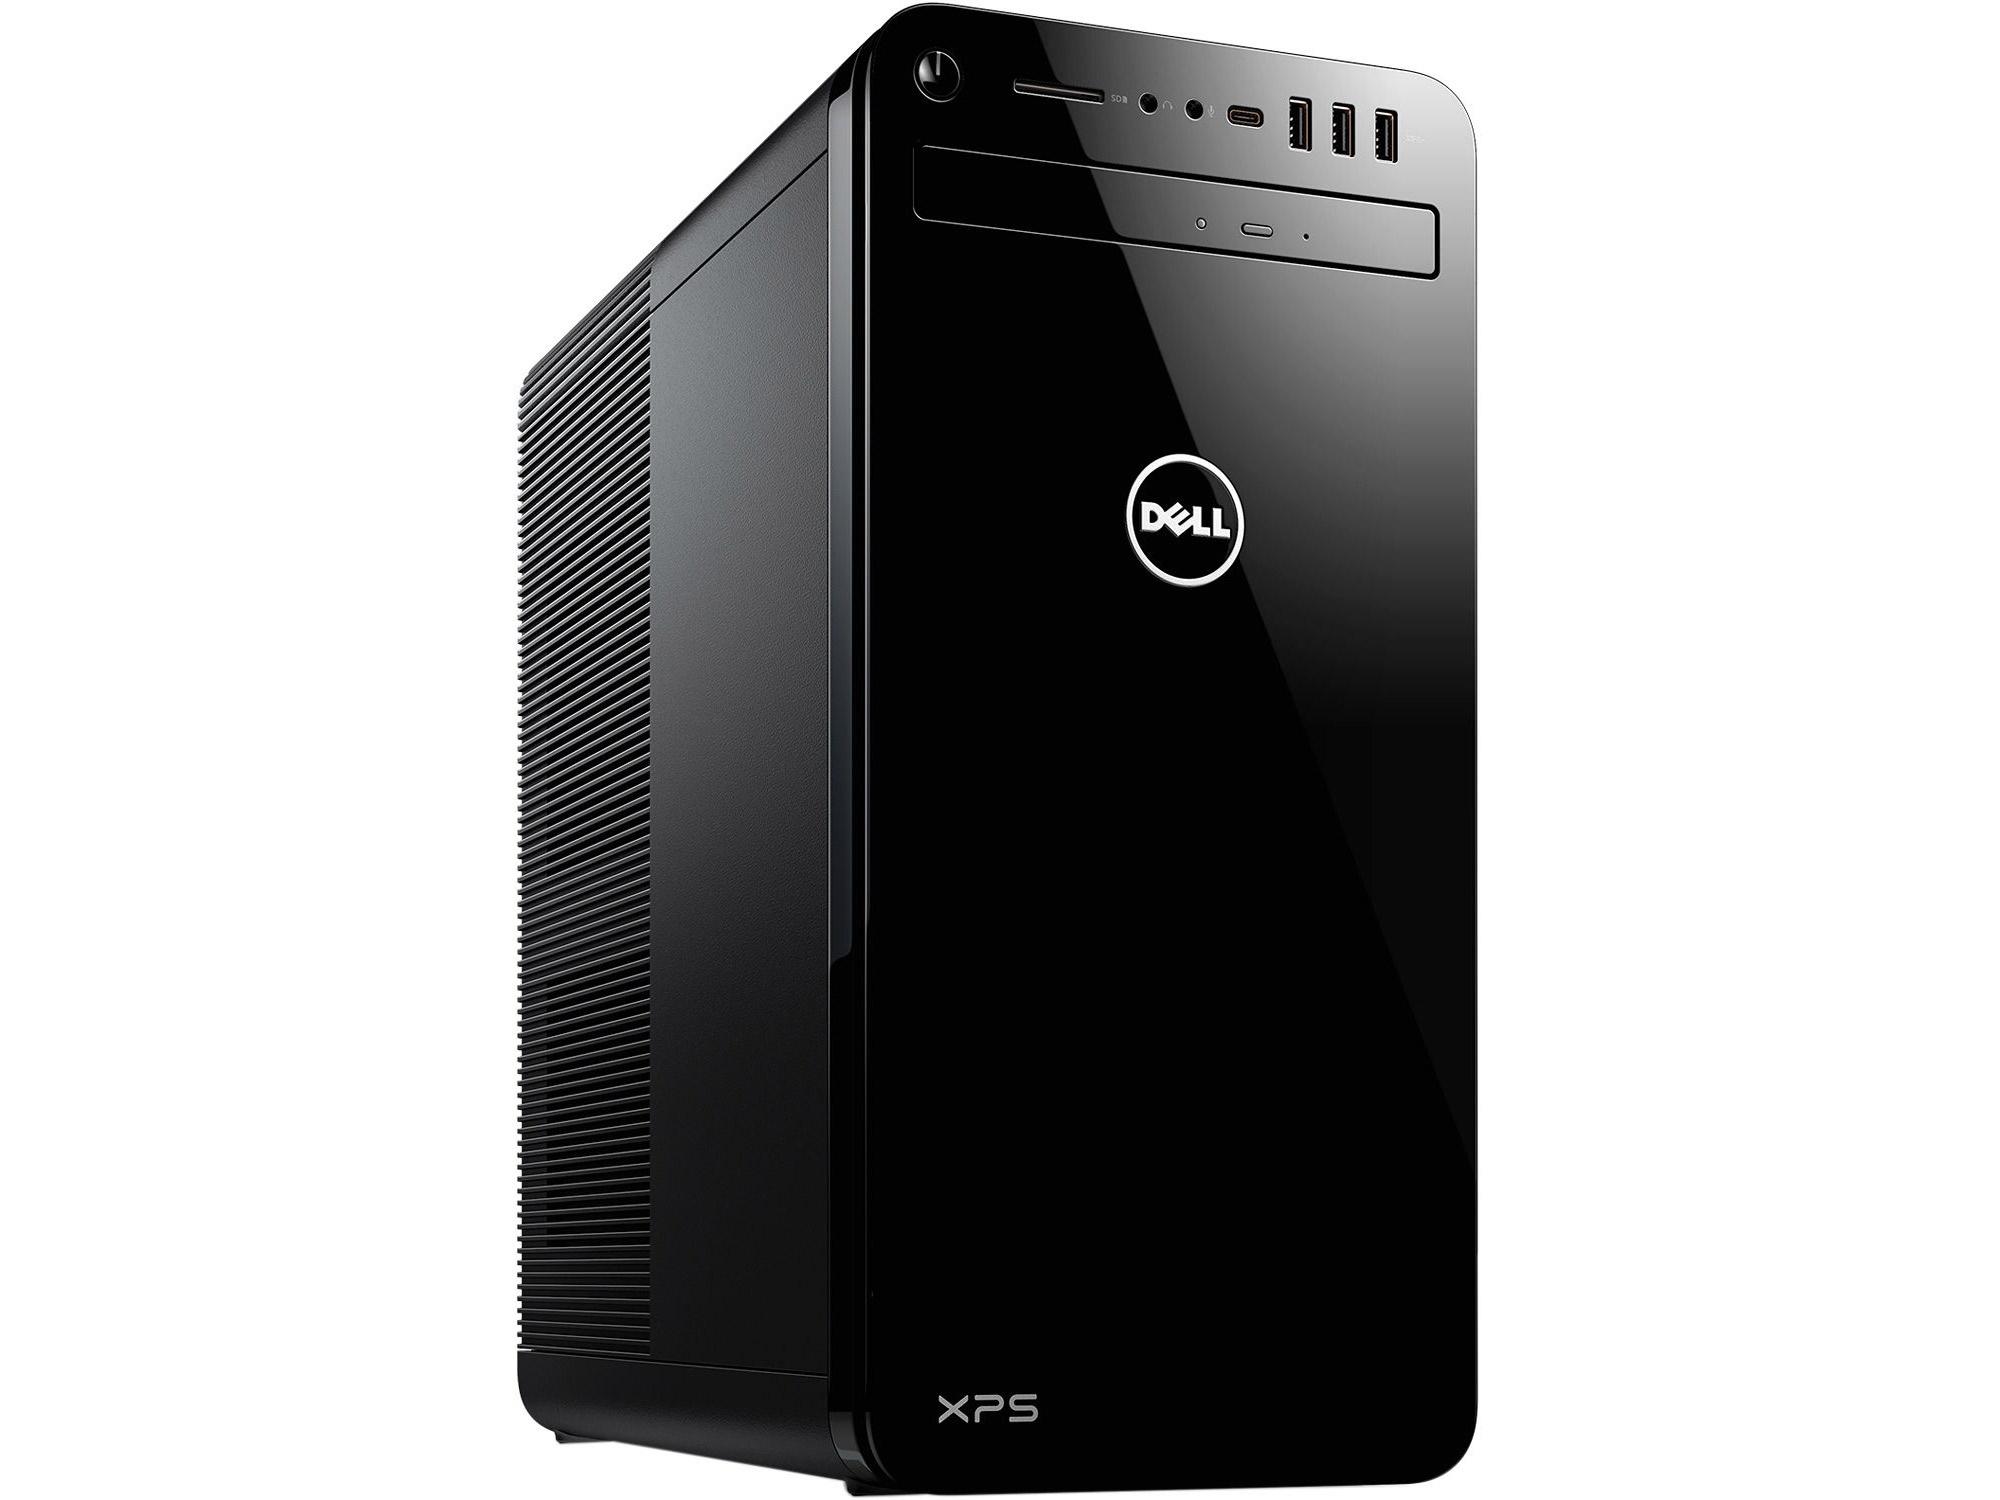 Máy tính bộ Dell XPS 8930 i7 - 8700 ( 3.2Ghz )  - 2x8G Ram - 2TB HDD  + 256G SSD - 6G VGA ( GeForce(R) GTX 1060 )  - DVDRW - Wifi,BT 4.0